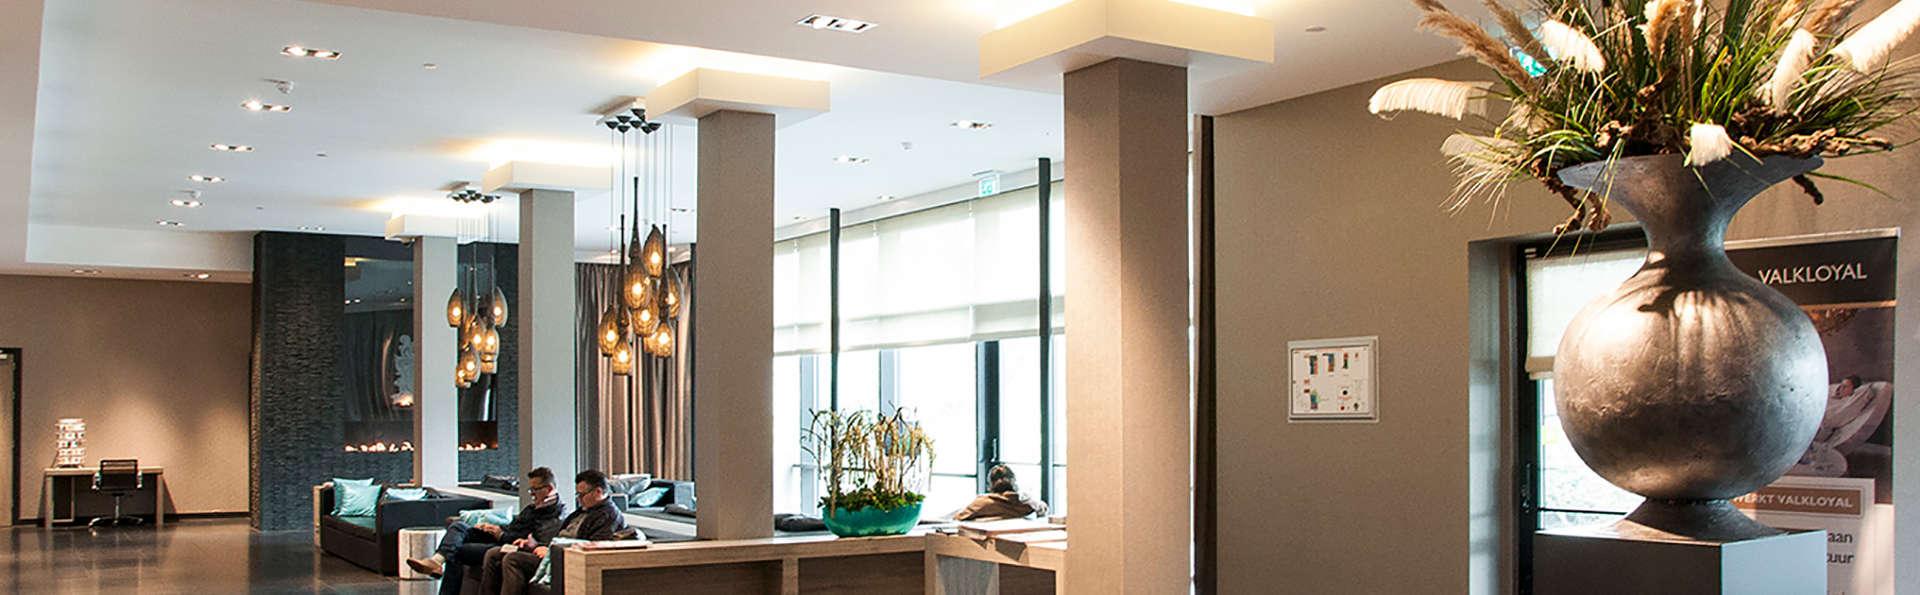 Van der Valk Hotel Vianen - Edit_Hall.jpg